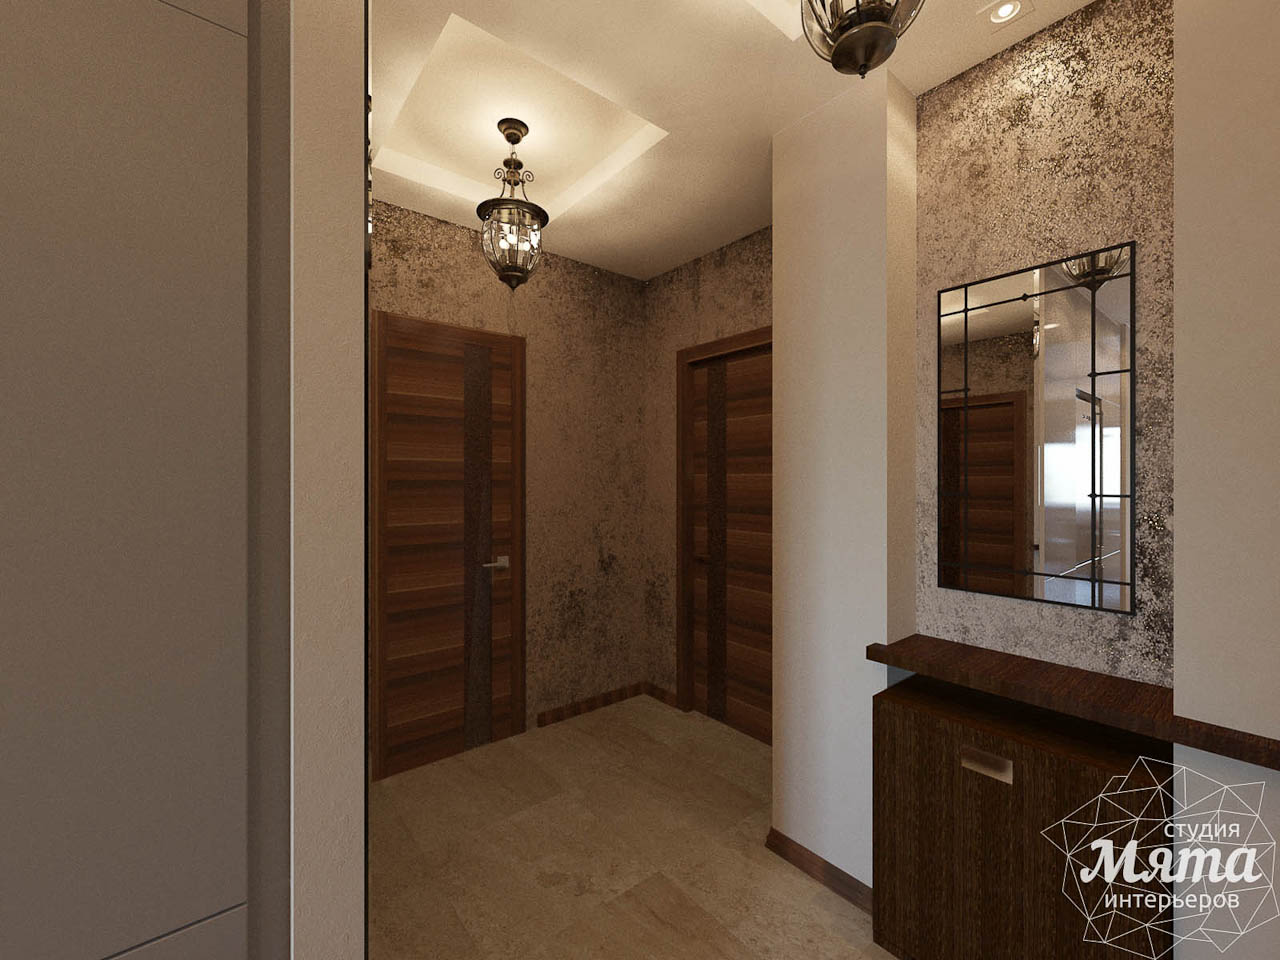 Дизайн интерьера трехкомнатной квартиры по ул. Мельникова 27 img967847511